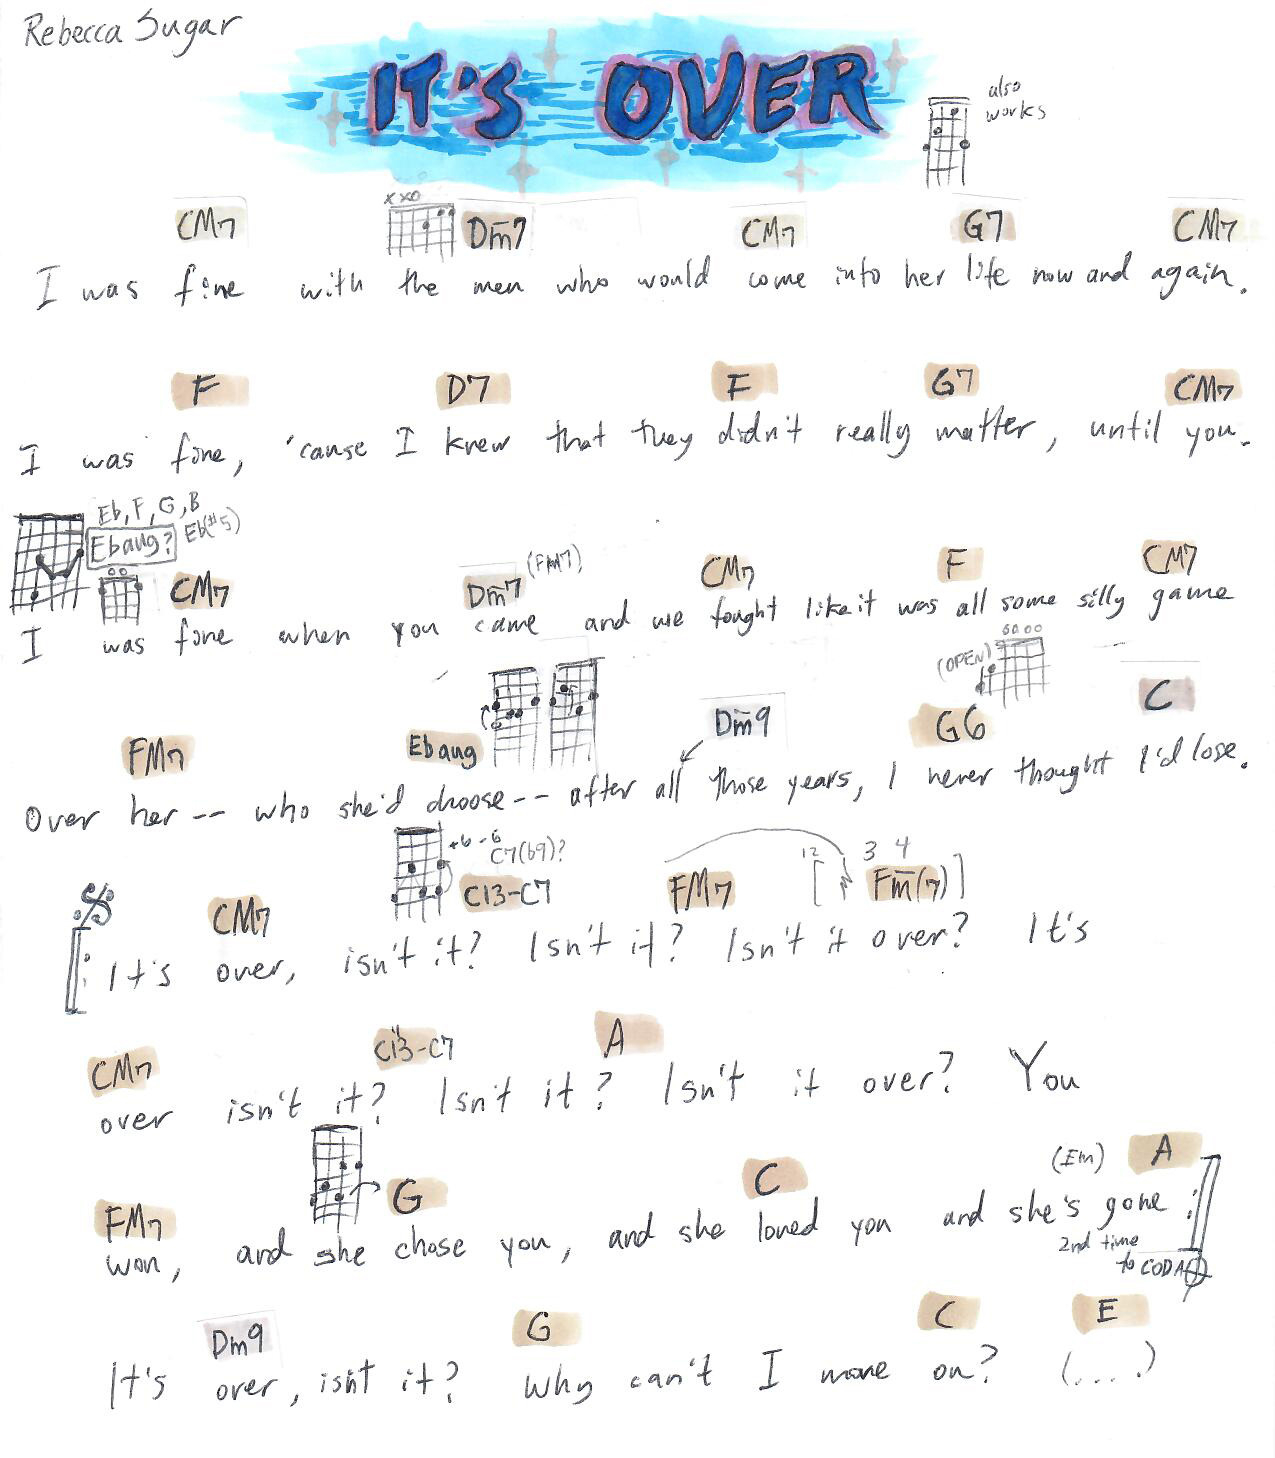 Steven Universe Ukulele Chords Steven Universe Ukulele Chords Tumblr